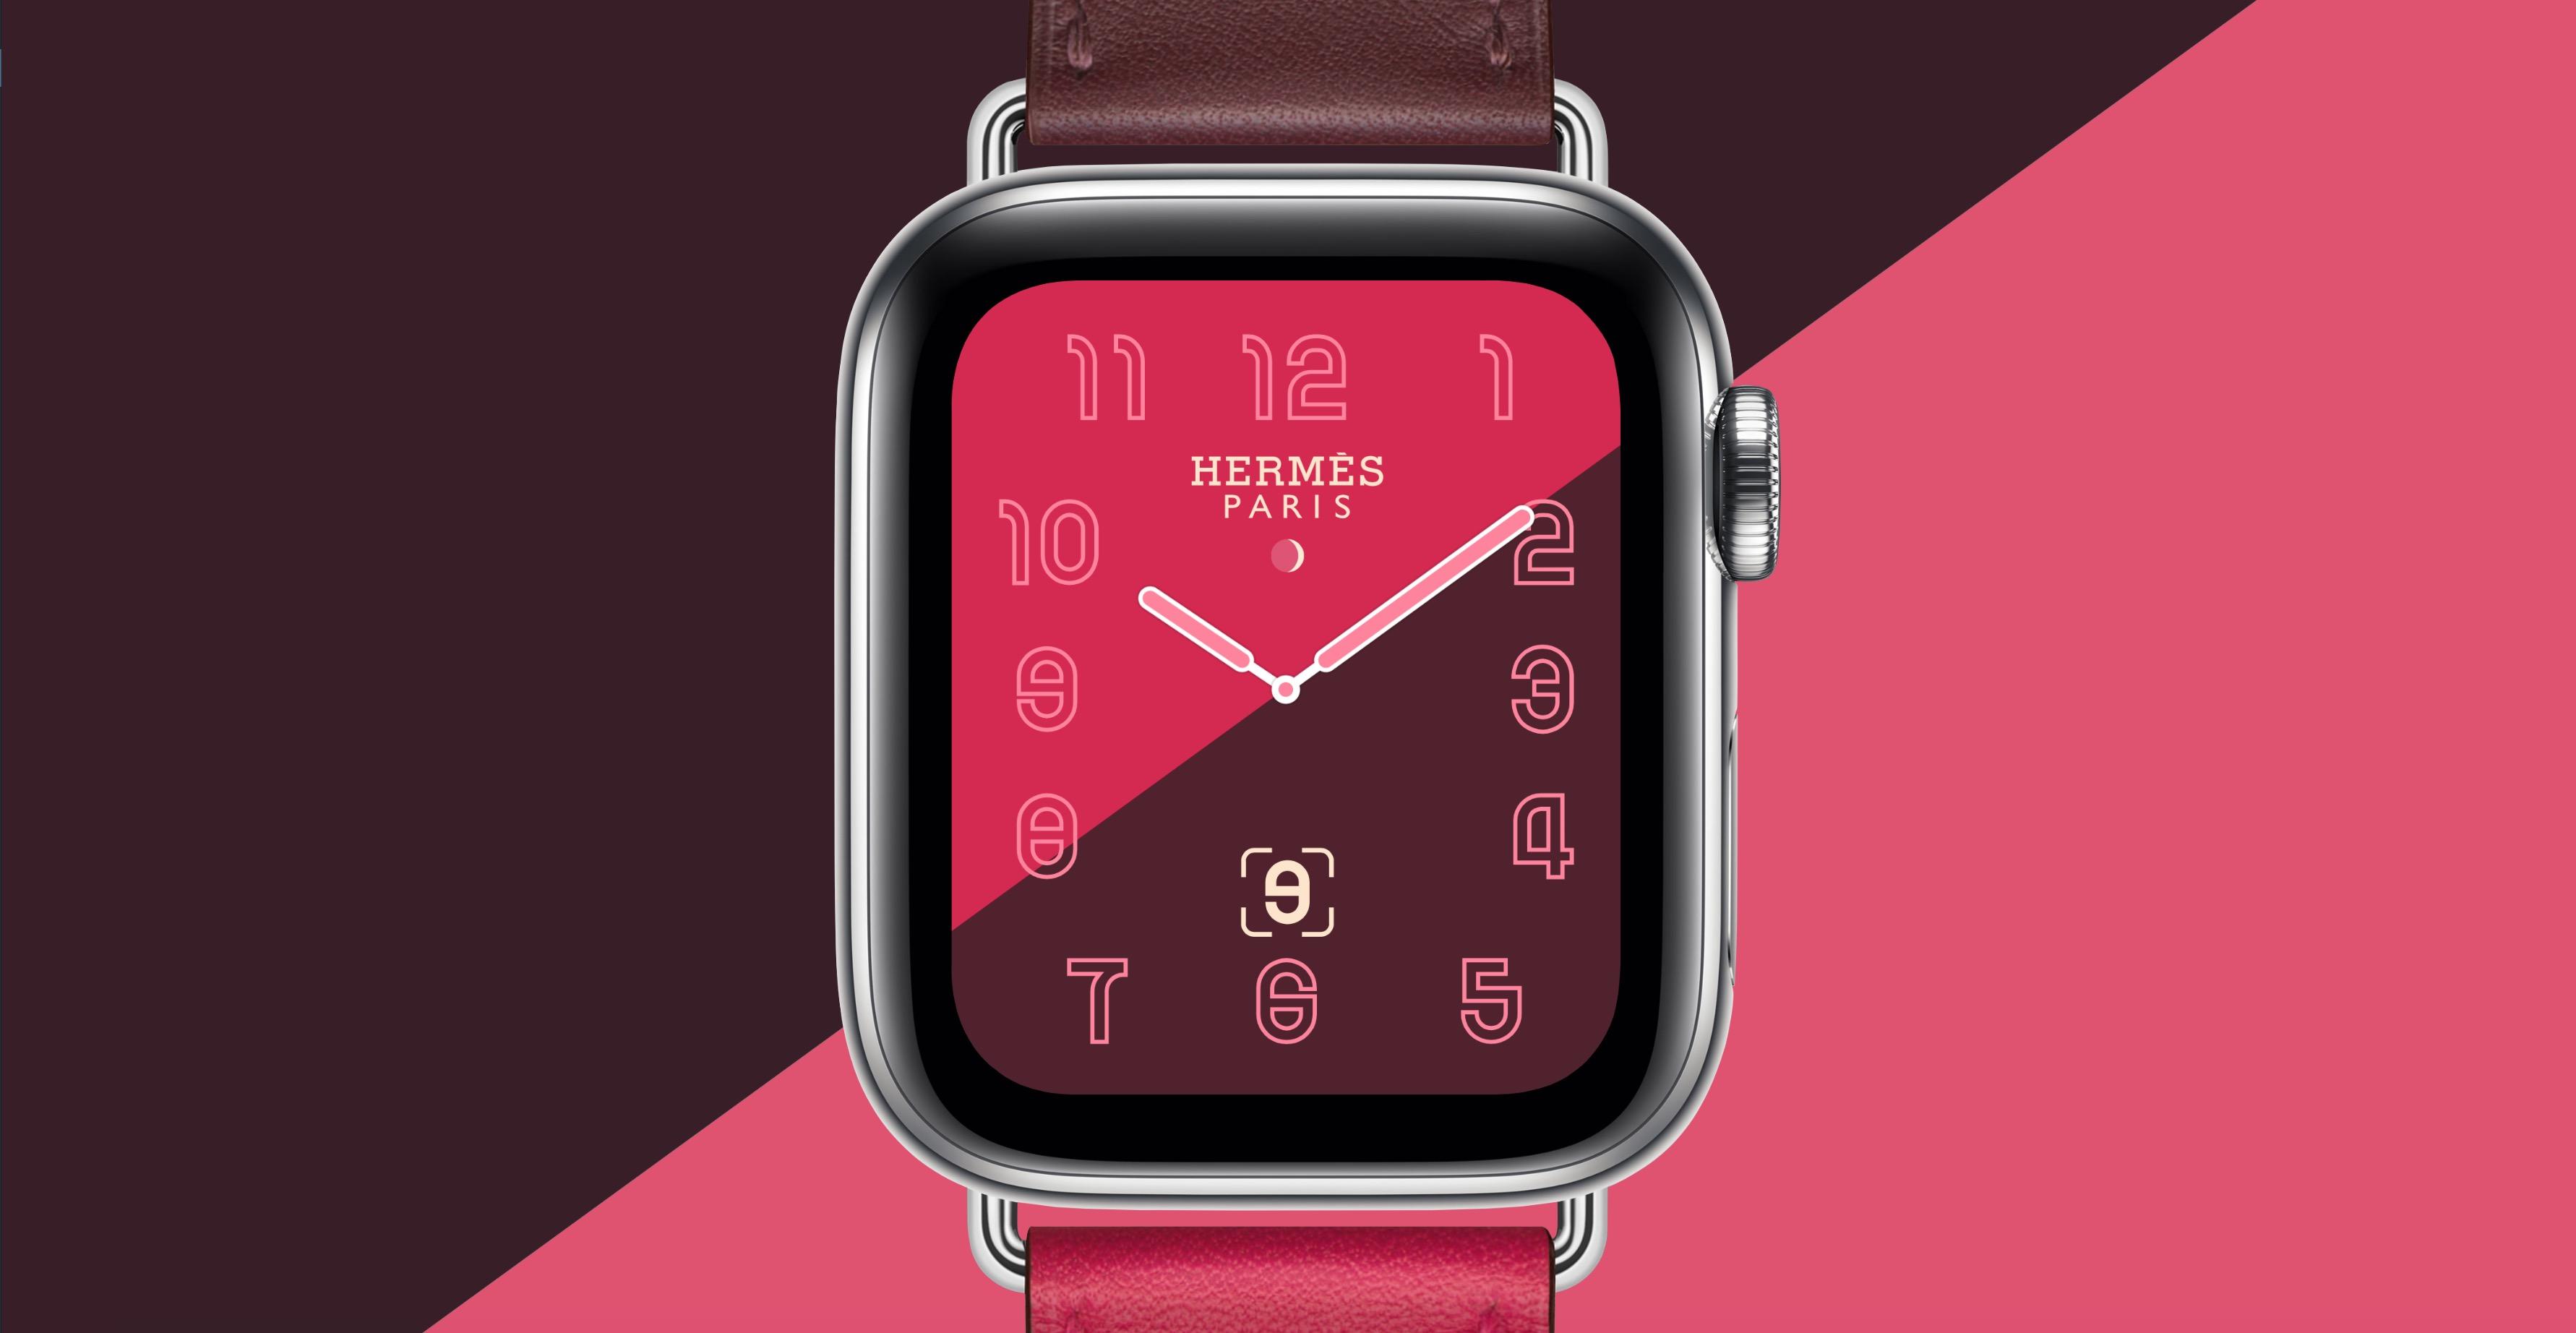 Apple Watch Hemès